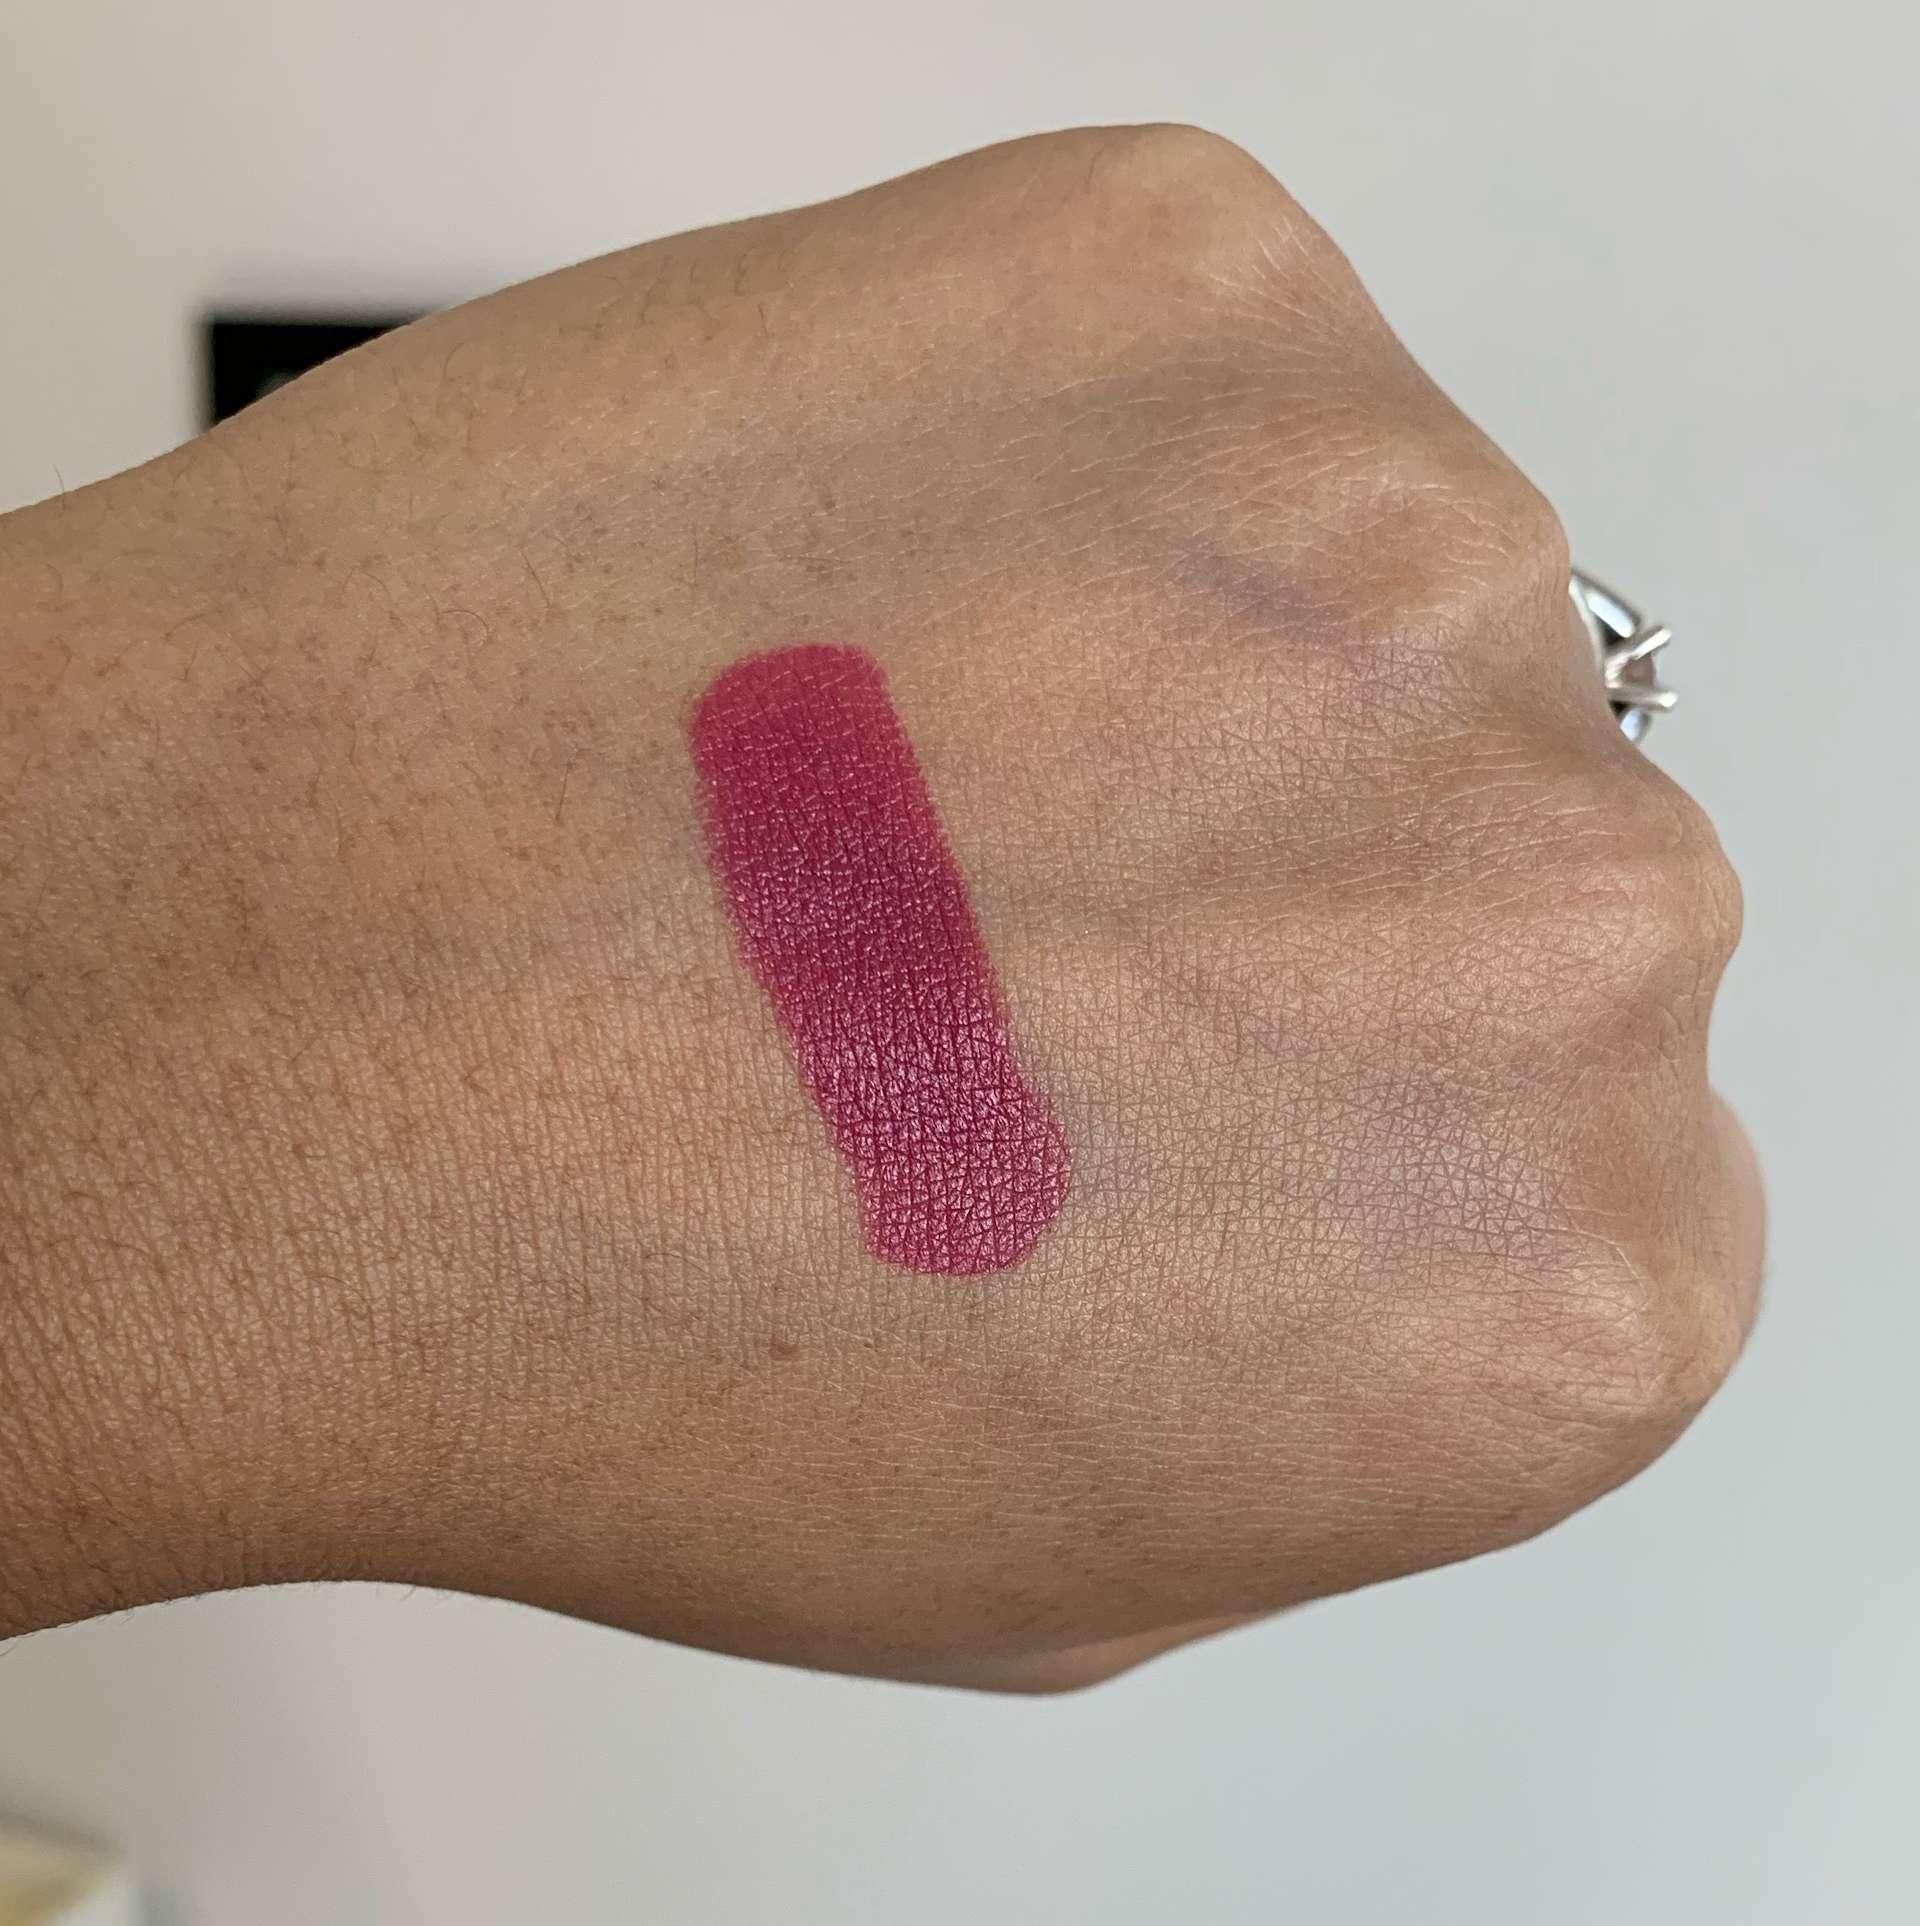 MAC Captive Satin Lipstick Swatch on Medium Dark Skin